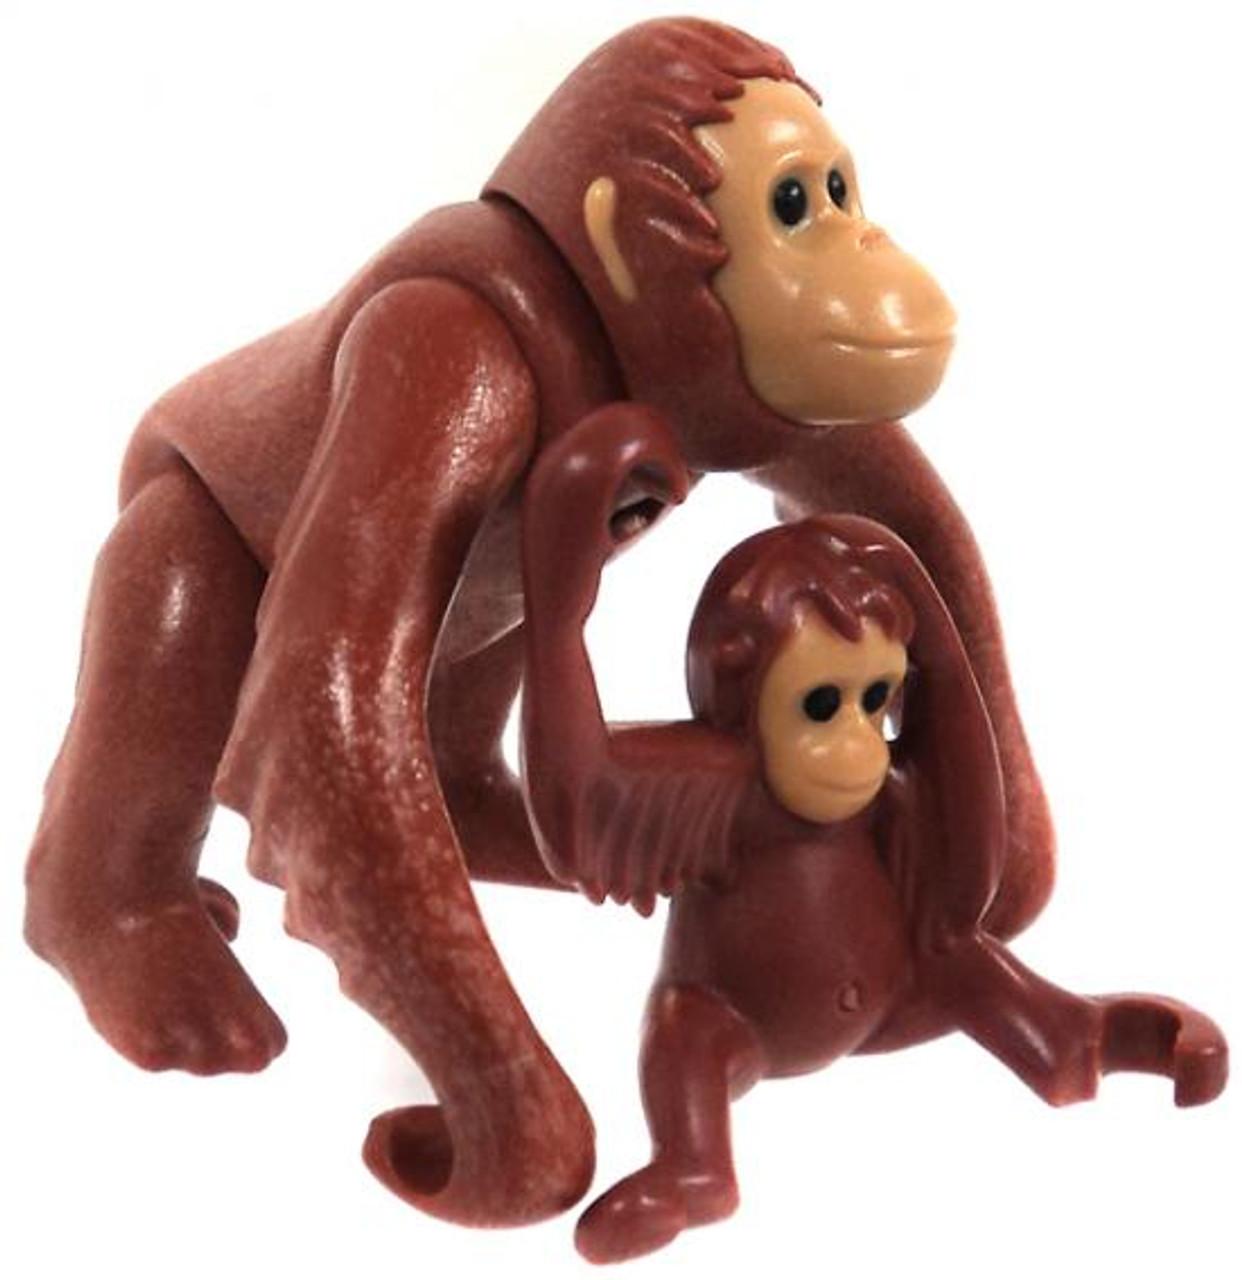 Playmobil Zoo Orangutan with Baby Set #6200